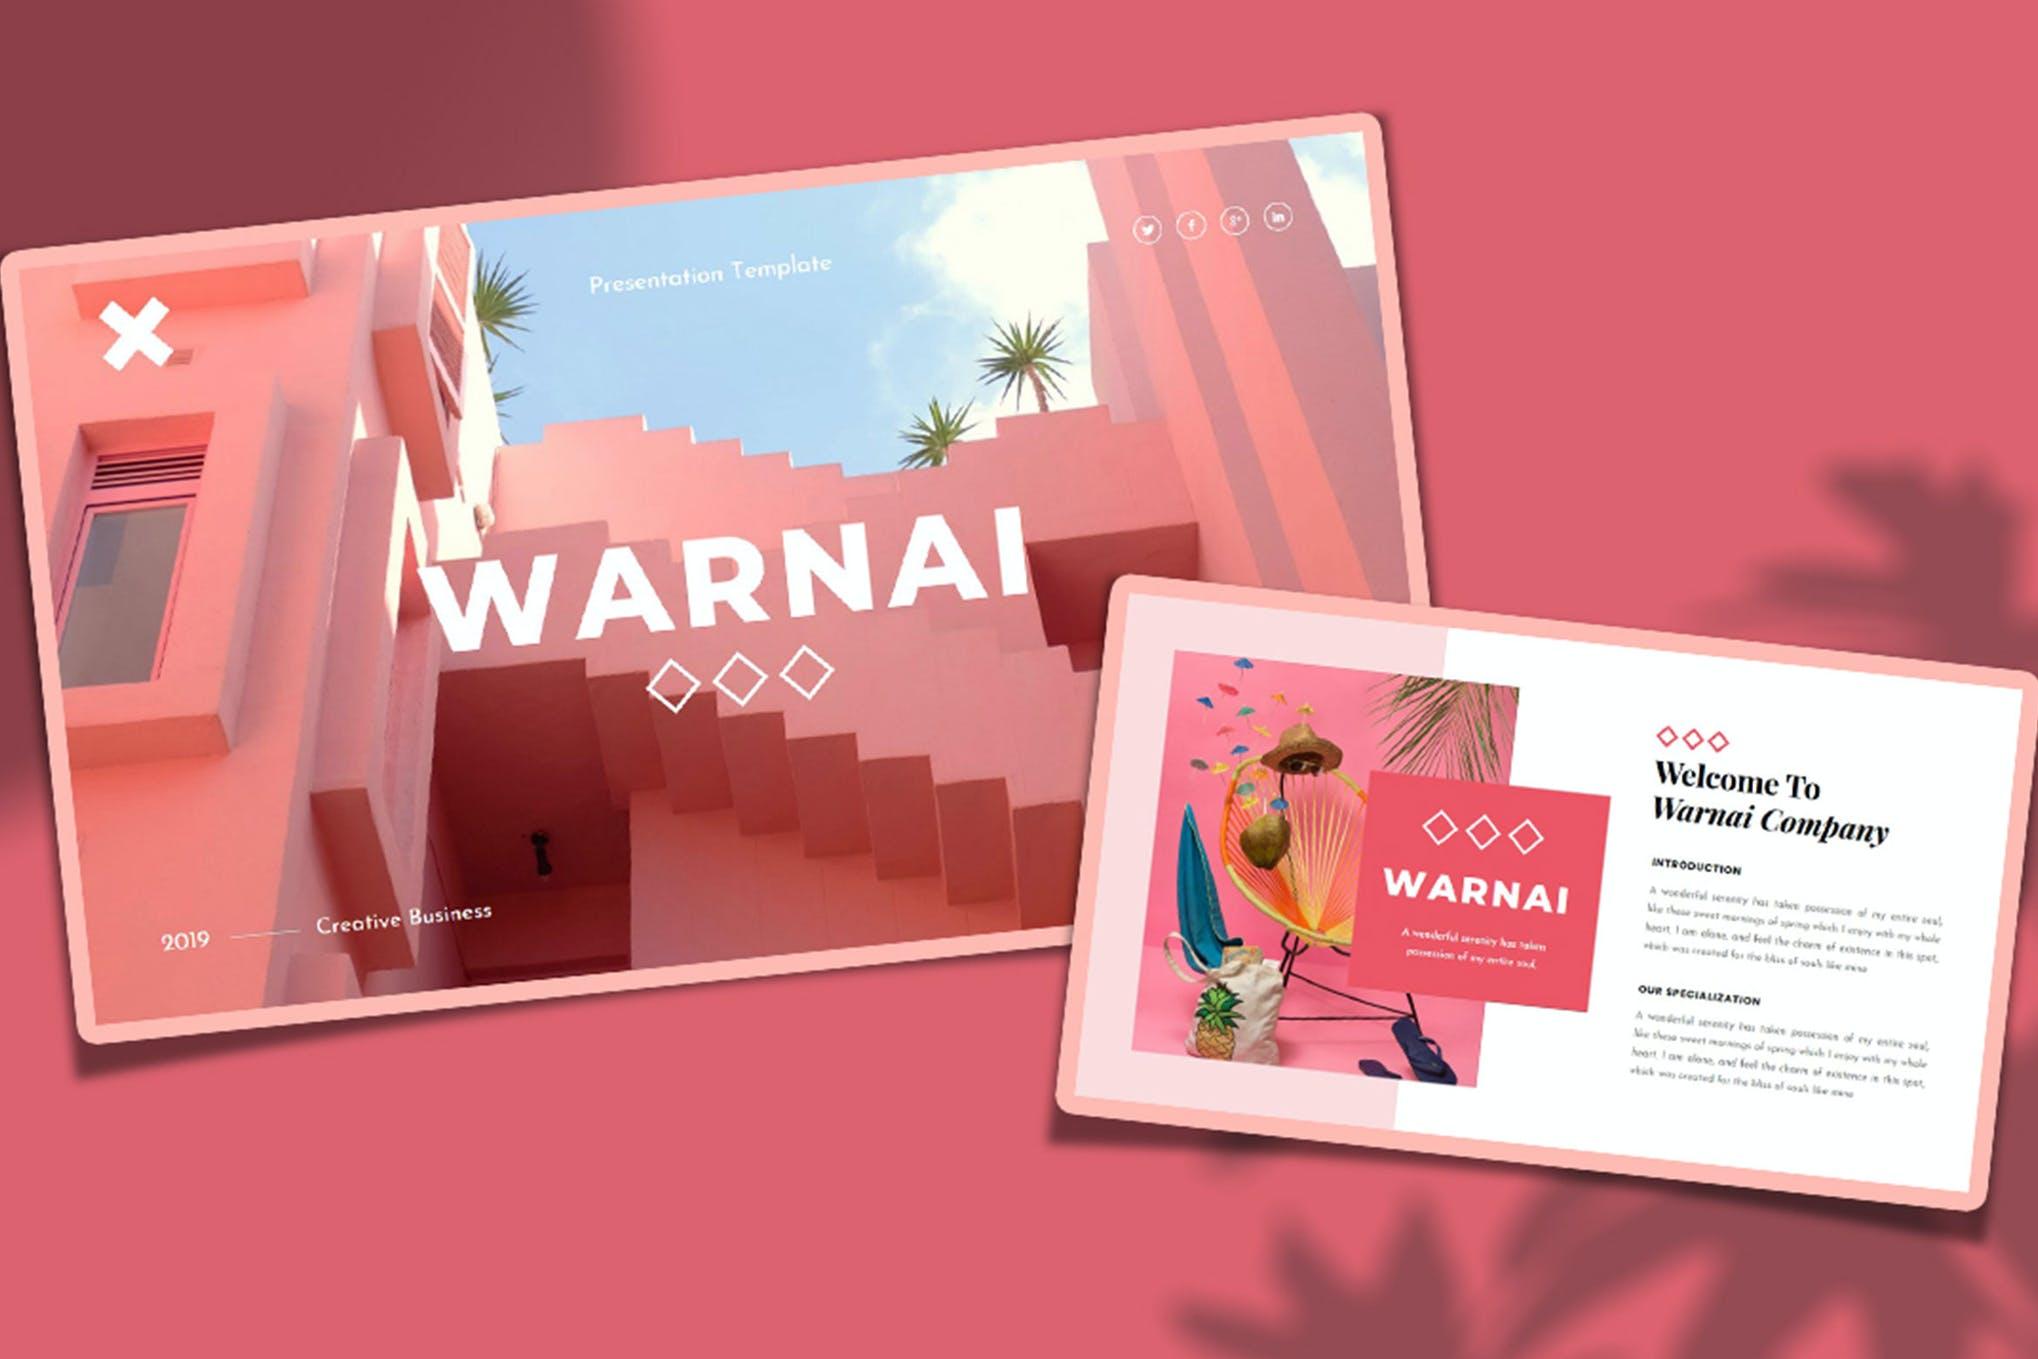 Warnai - Creative Business PowerPoint Template